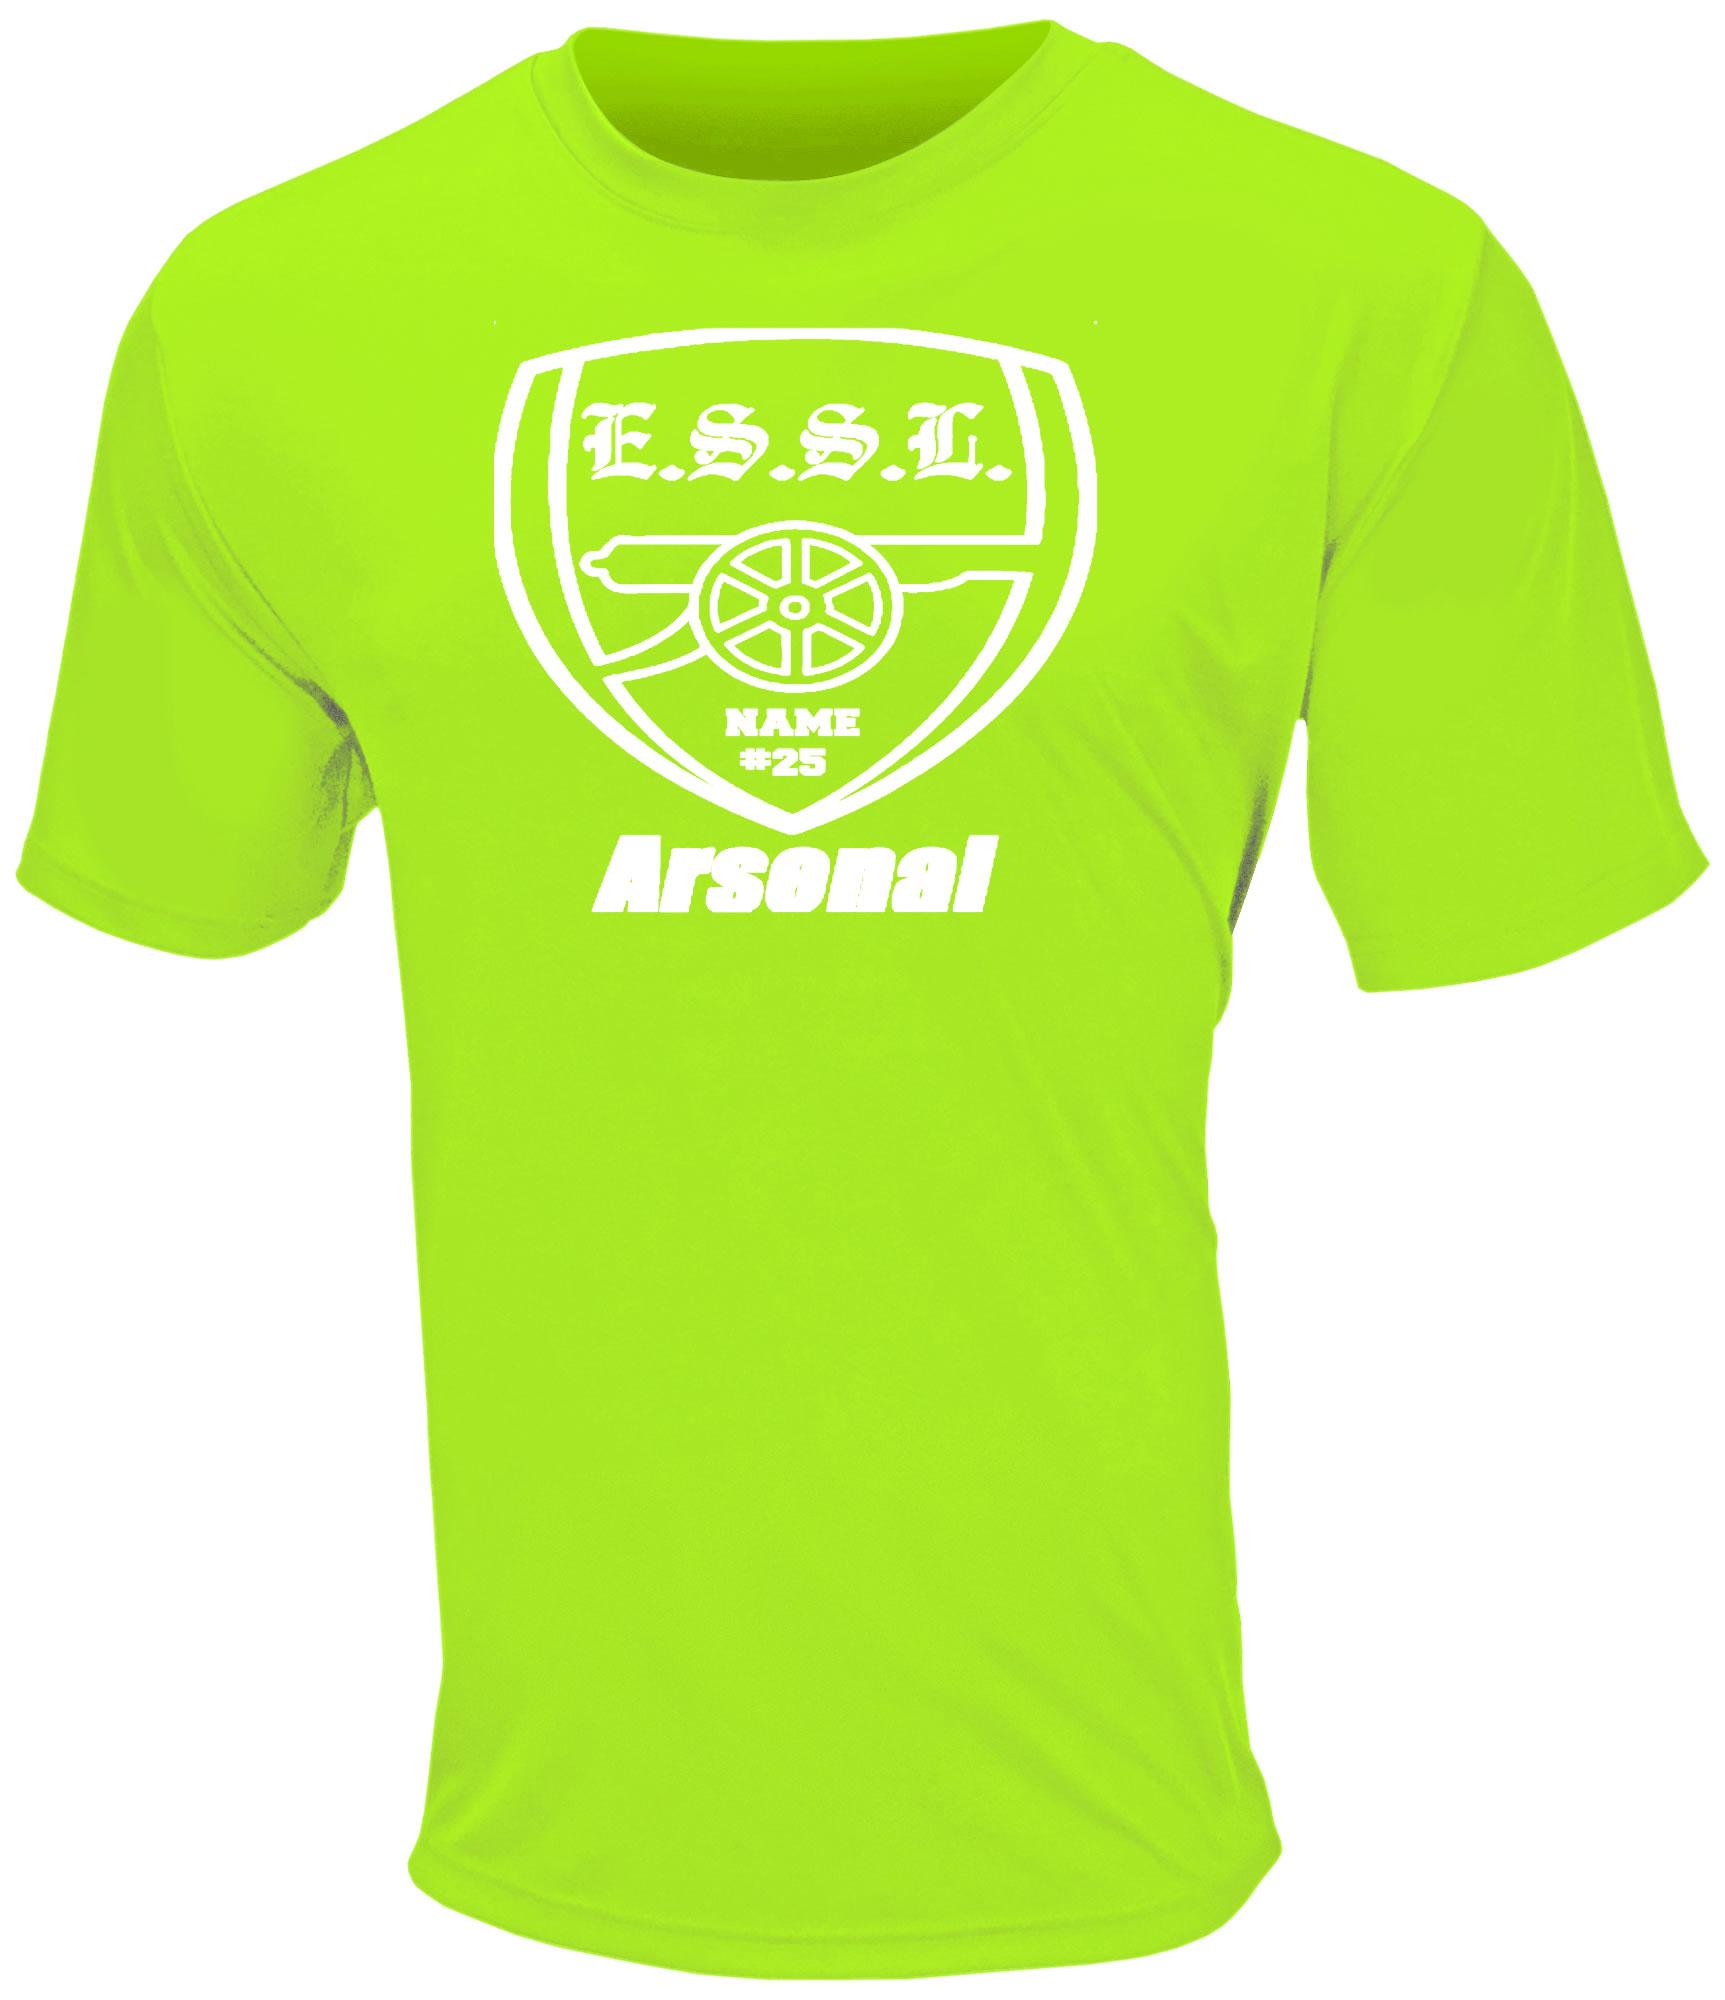 E.S.S.L. Soccer Club Cool Performance T